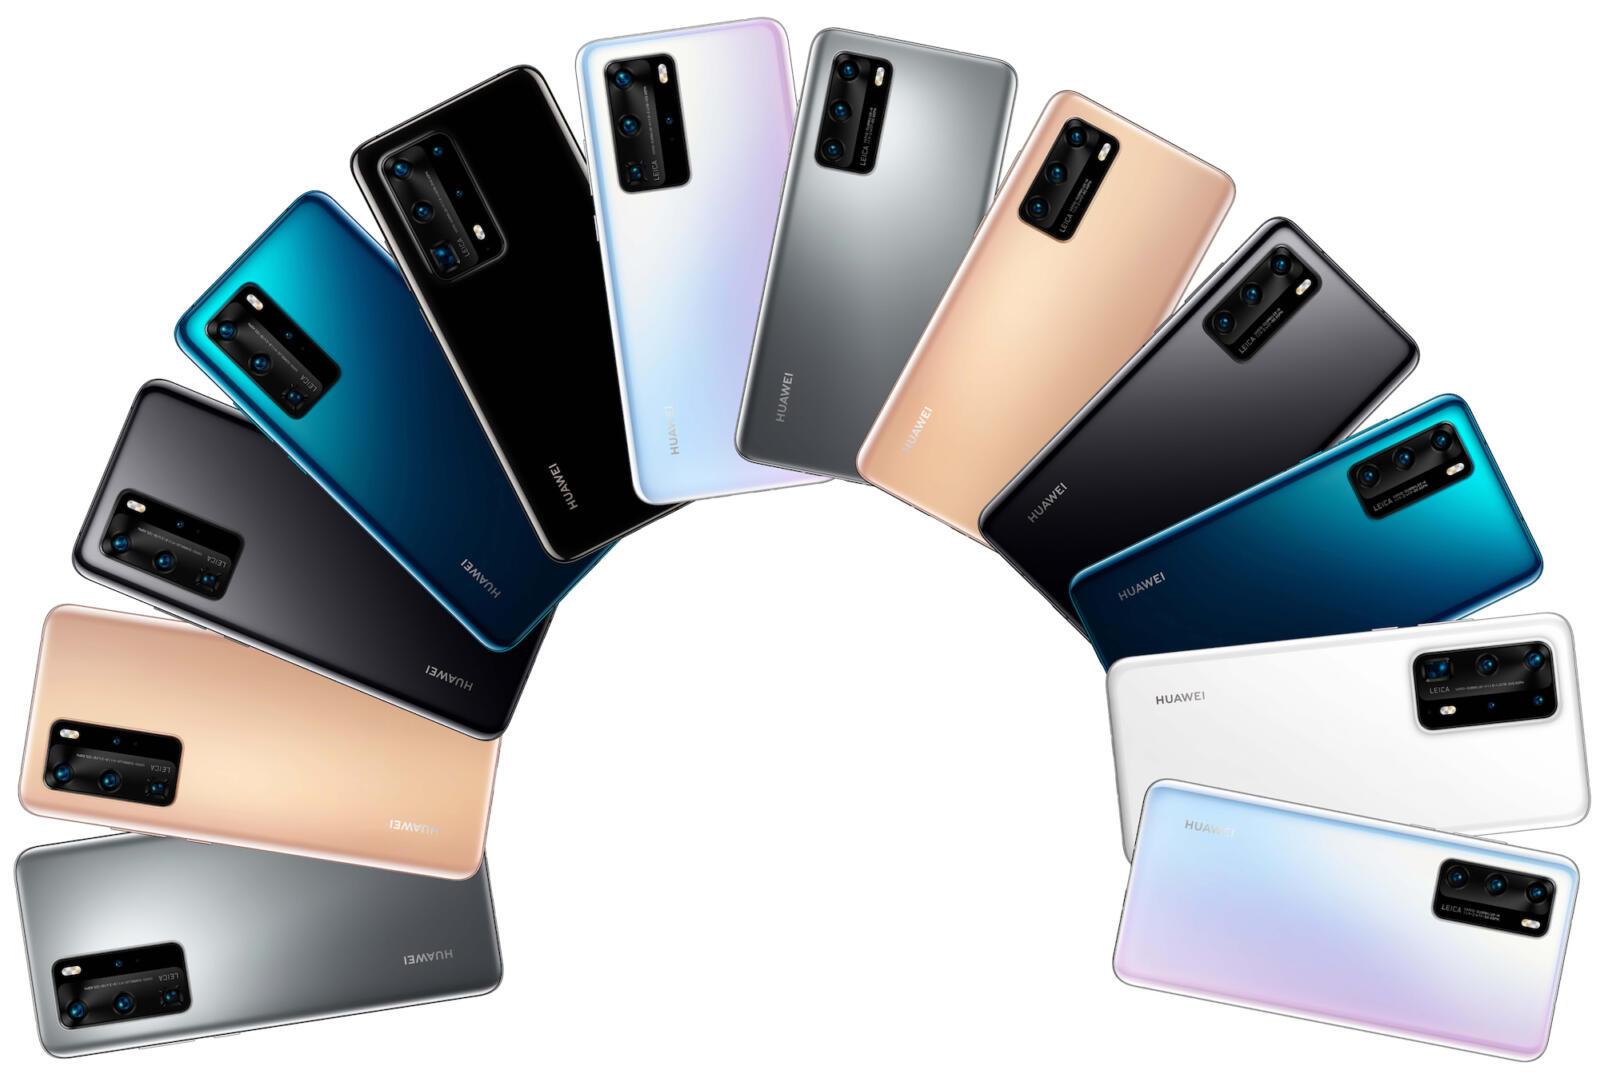 Huawei P40 Lineup Farben